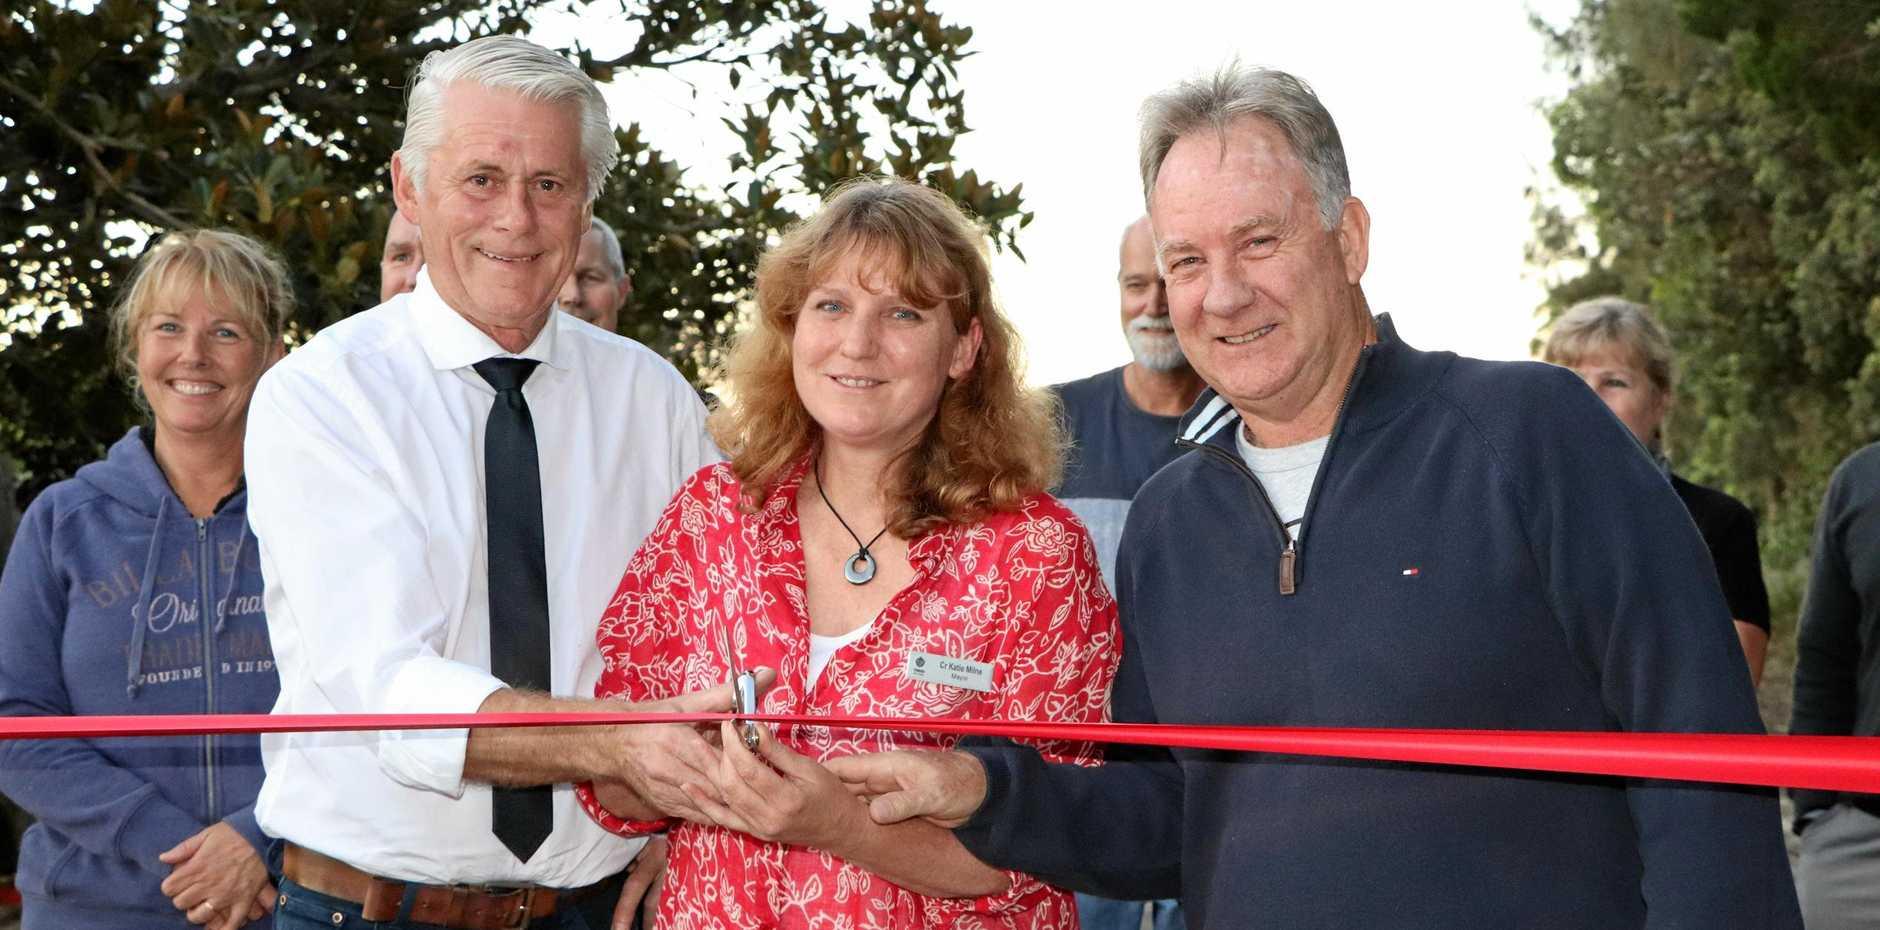 Tweed MP Geoff Provest, Mayor Katie Milne and President of the Casuarina, Seaside and Salt Residents Association Mark Grunwald.